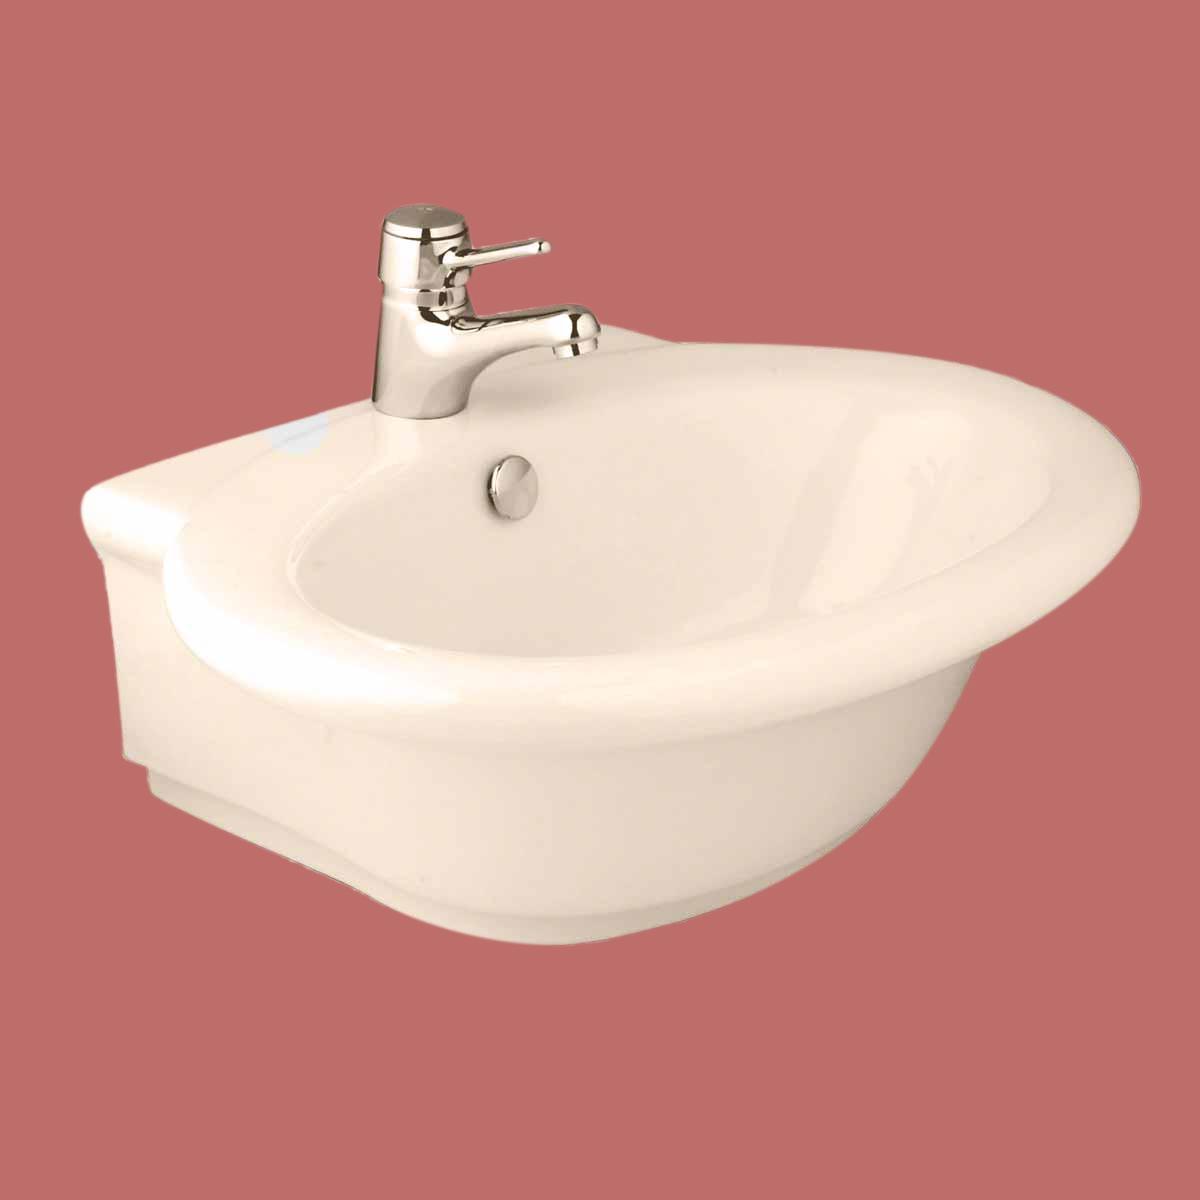 Bathroom Vessel Sink Bone China Faucet Hole